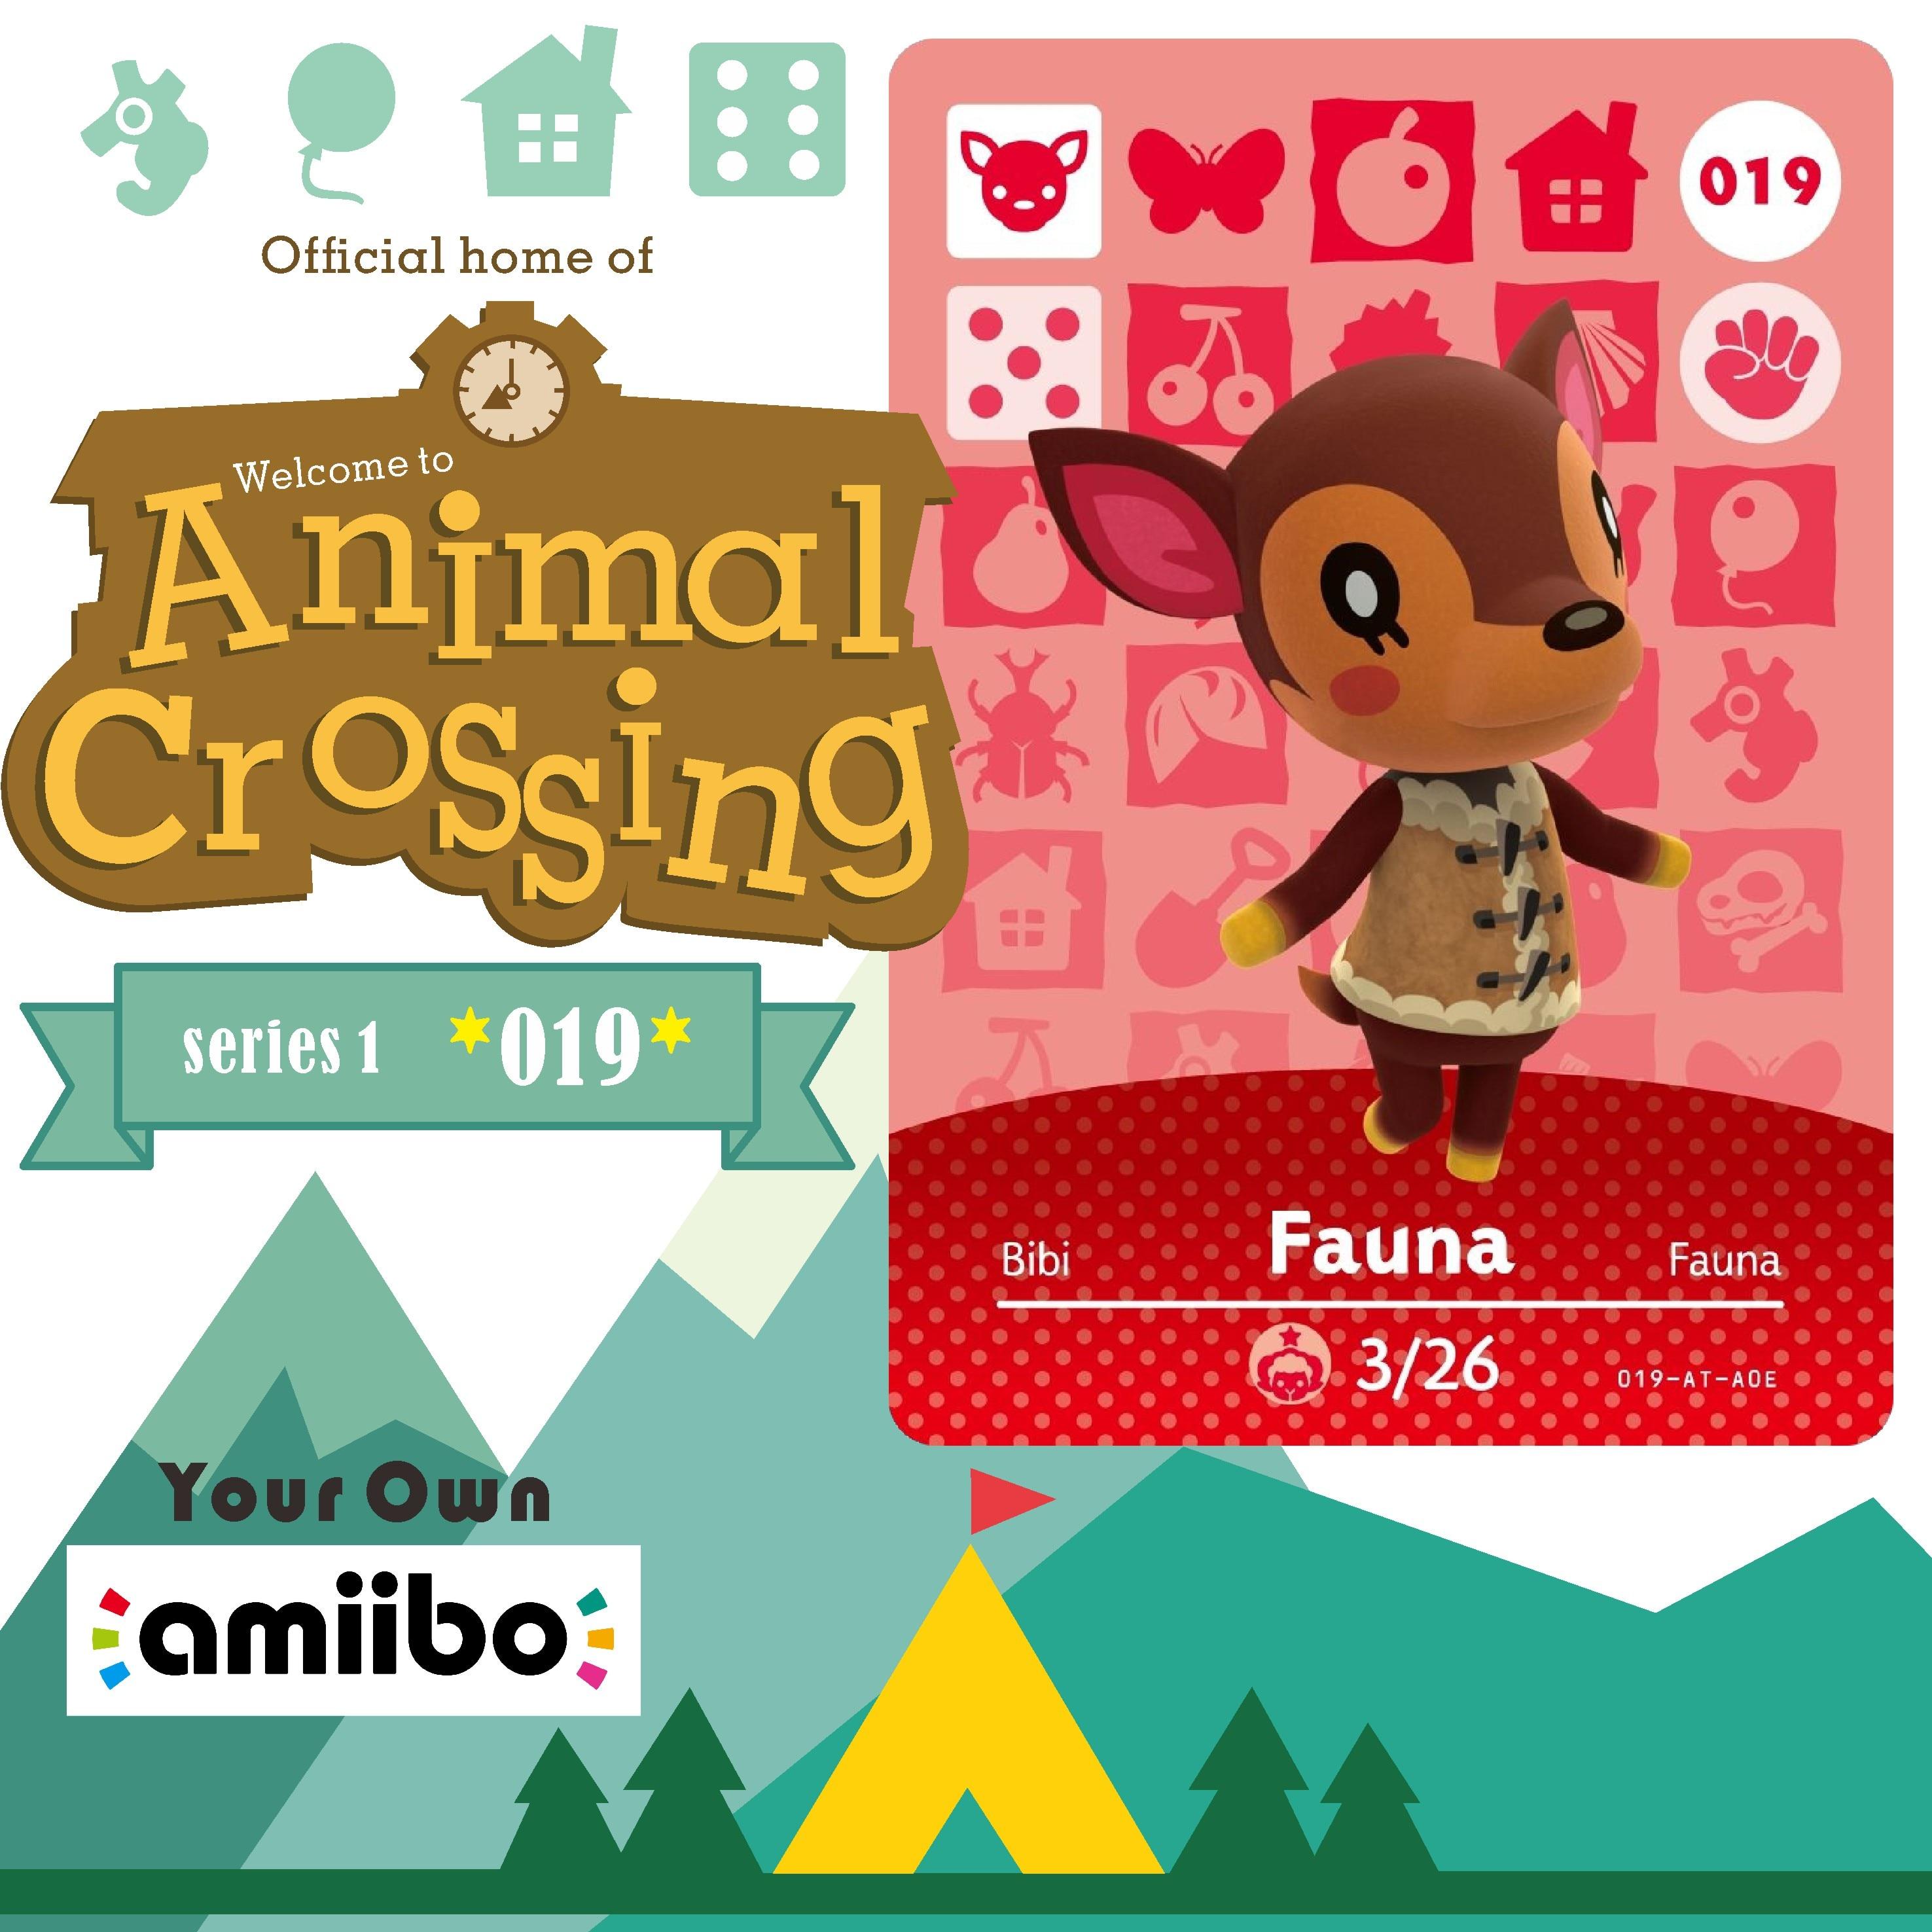 019 Fauna Welcome Amiibo Game Cross Card Animal Crossing Card Amiibo Nfc Card Series 1 Work for Amiibo Animal Crossing Ns Games